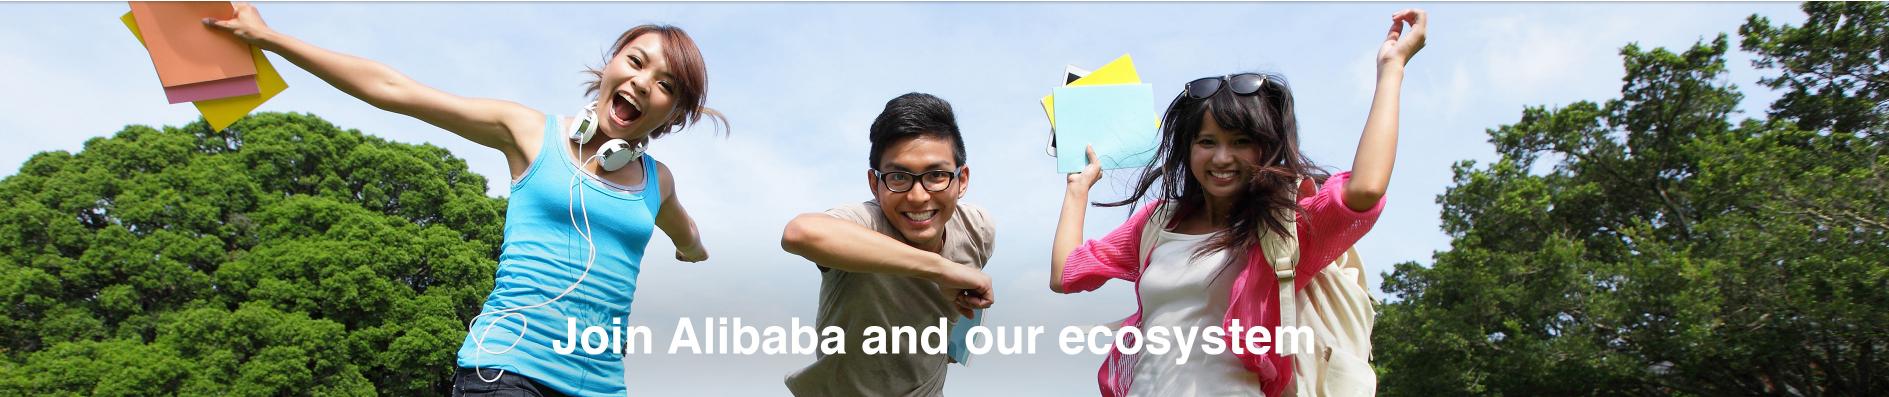 Alibaba profile banner